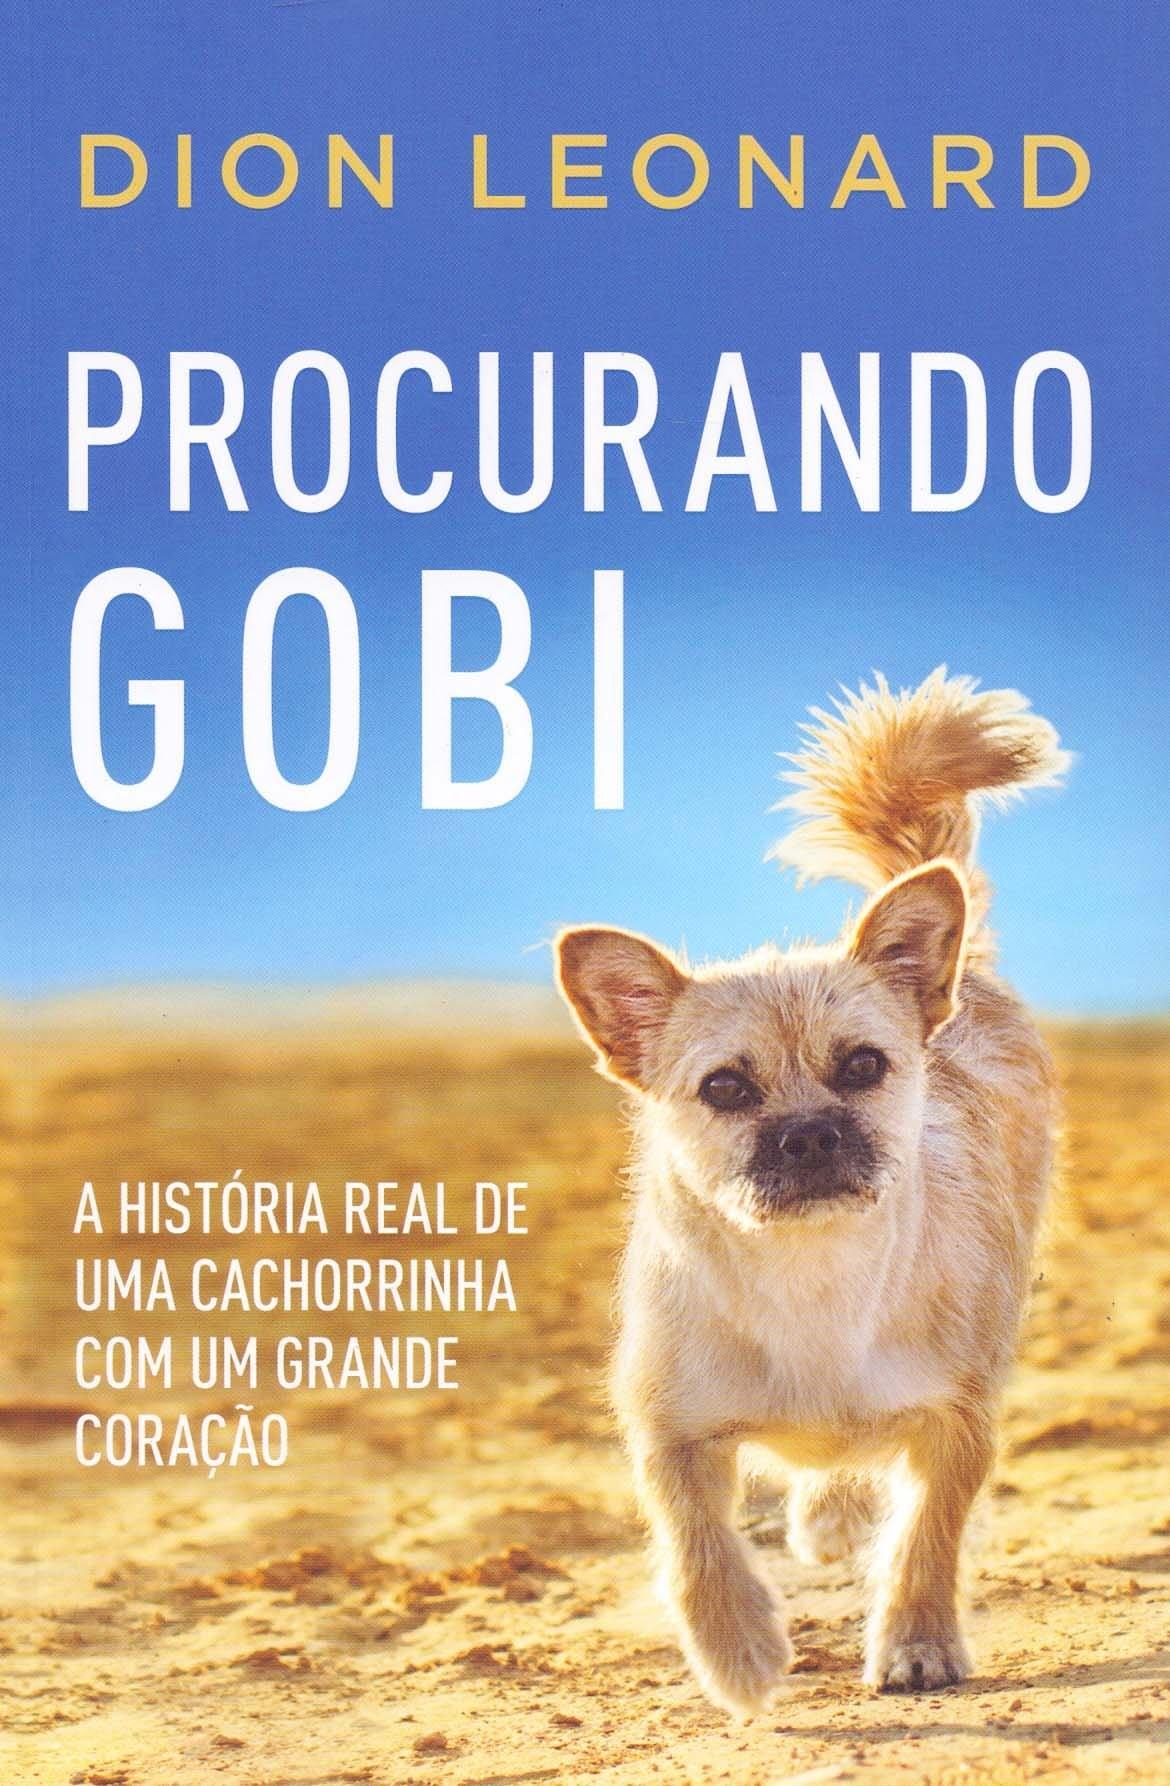 PROCURANDO GOBI